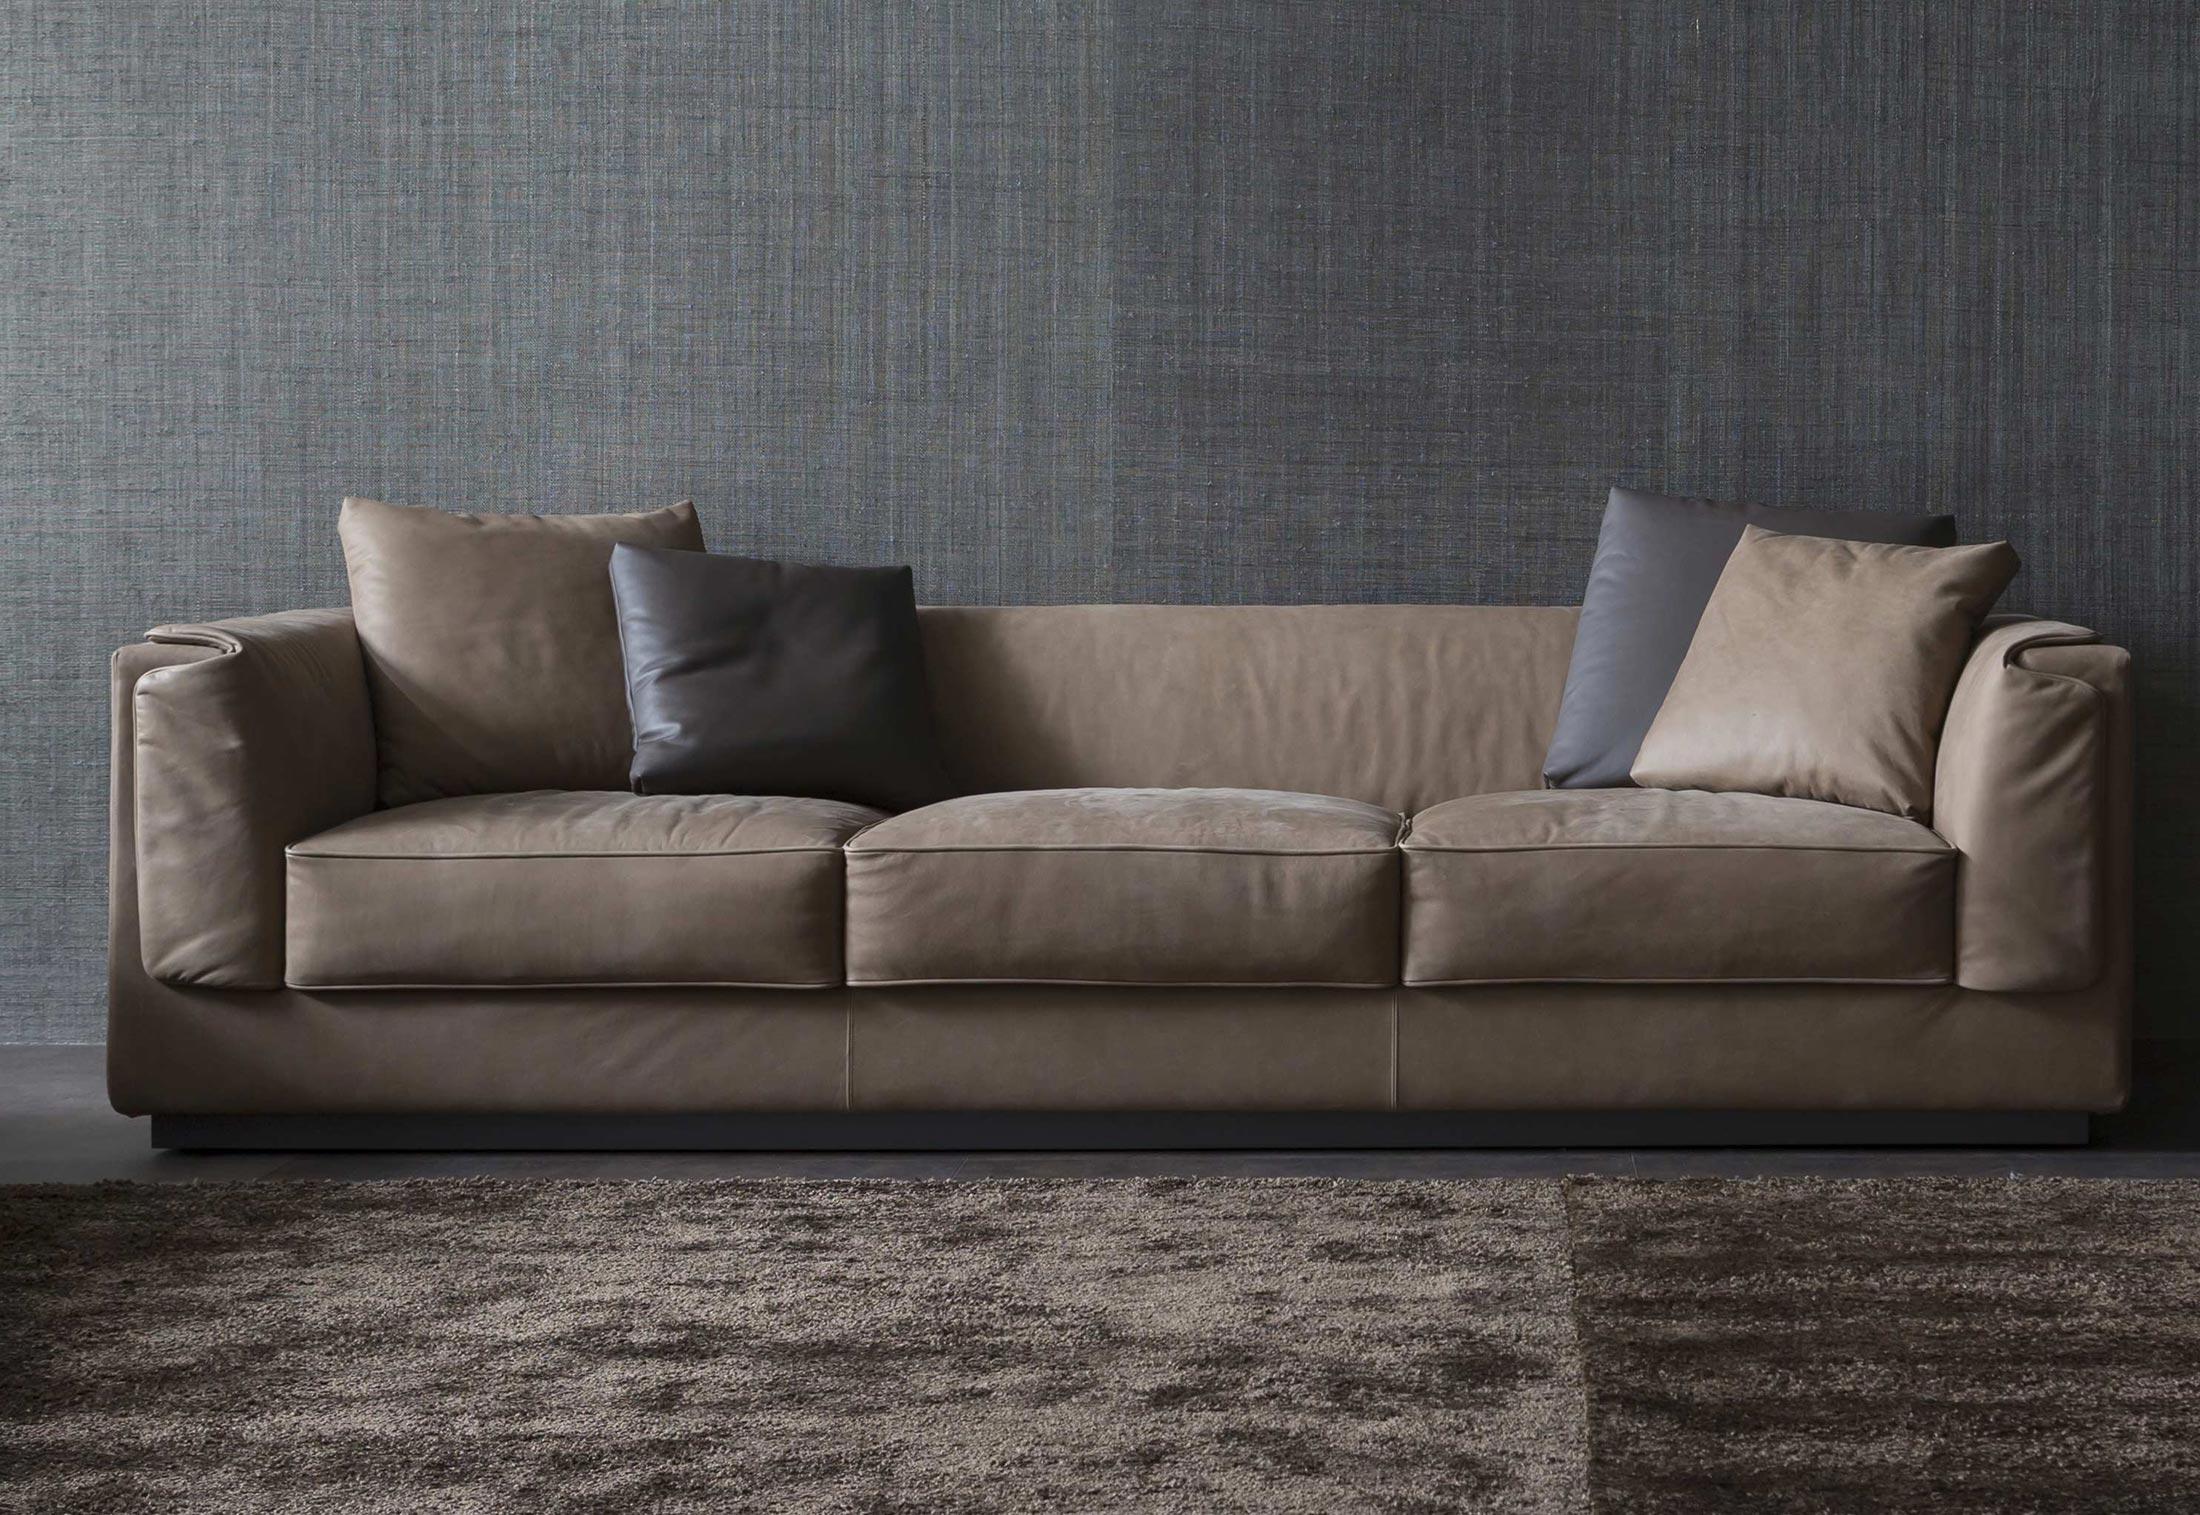 gentleman sofa von flou stylepark. Black Bedroom Furniture Sets. Home Design Ideas